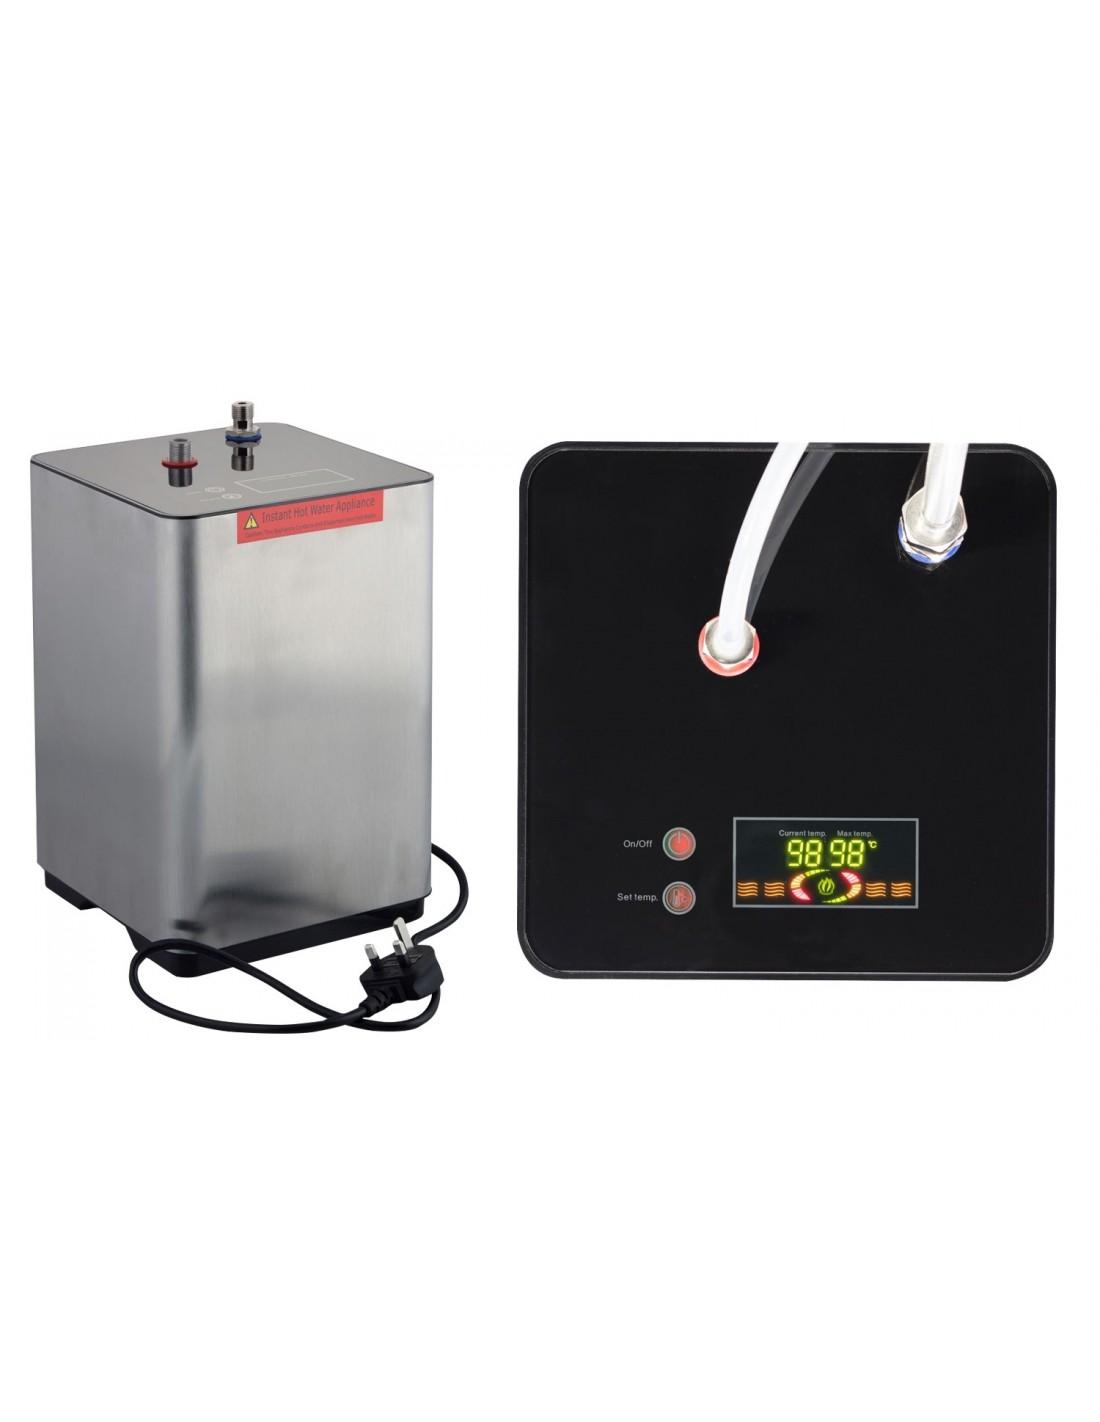 New Amanzi Boiling Hot Water Hot Chrome Tank Amp Filter Set